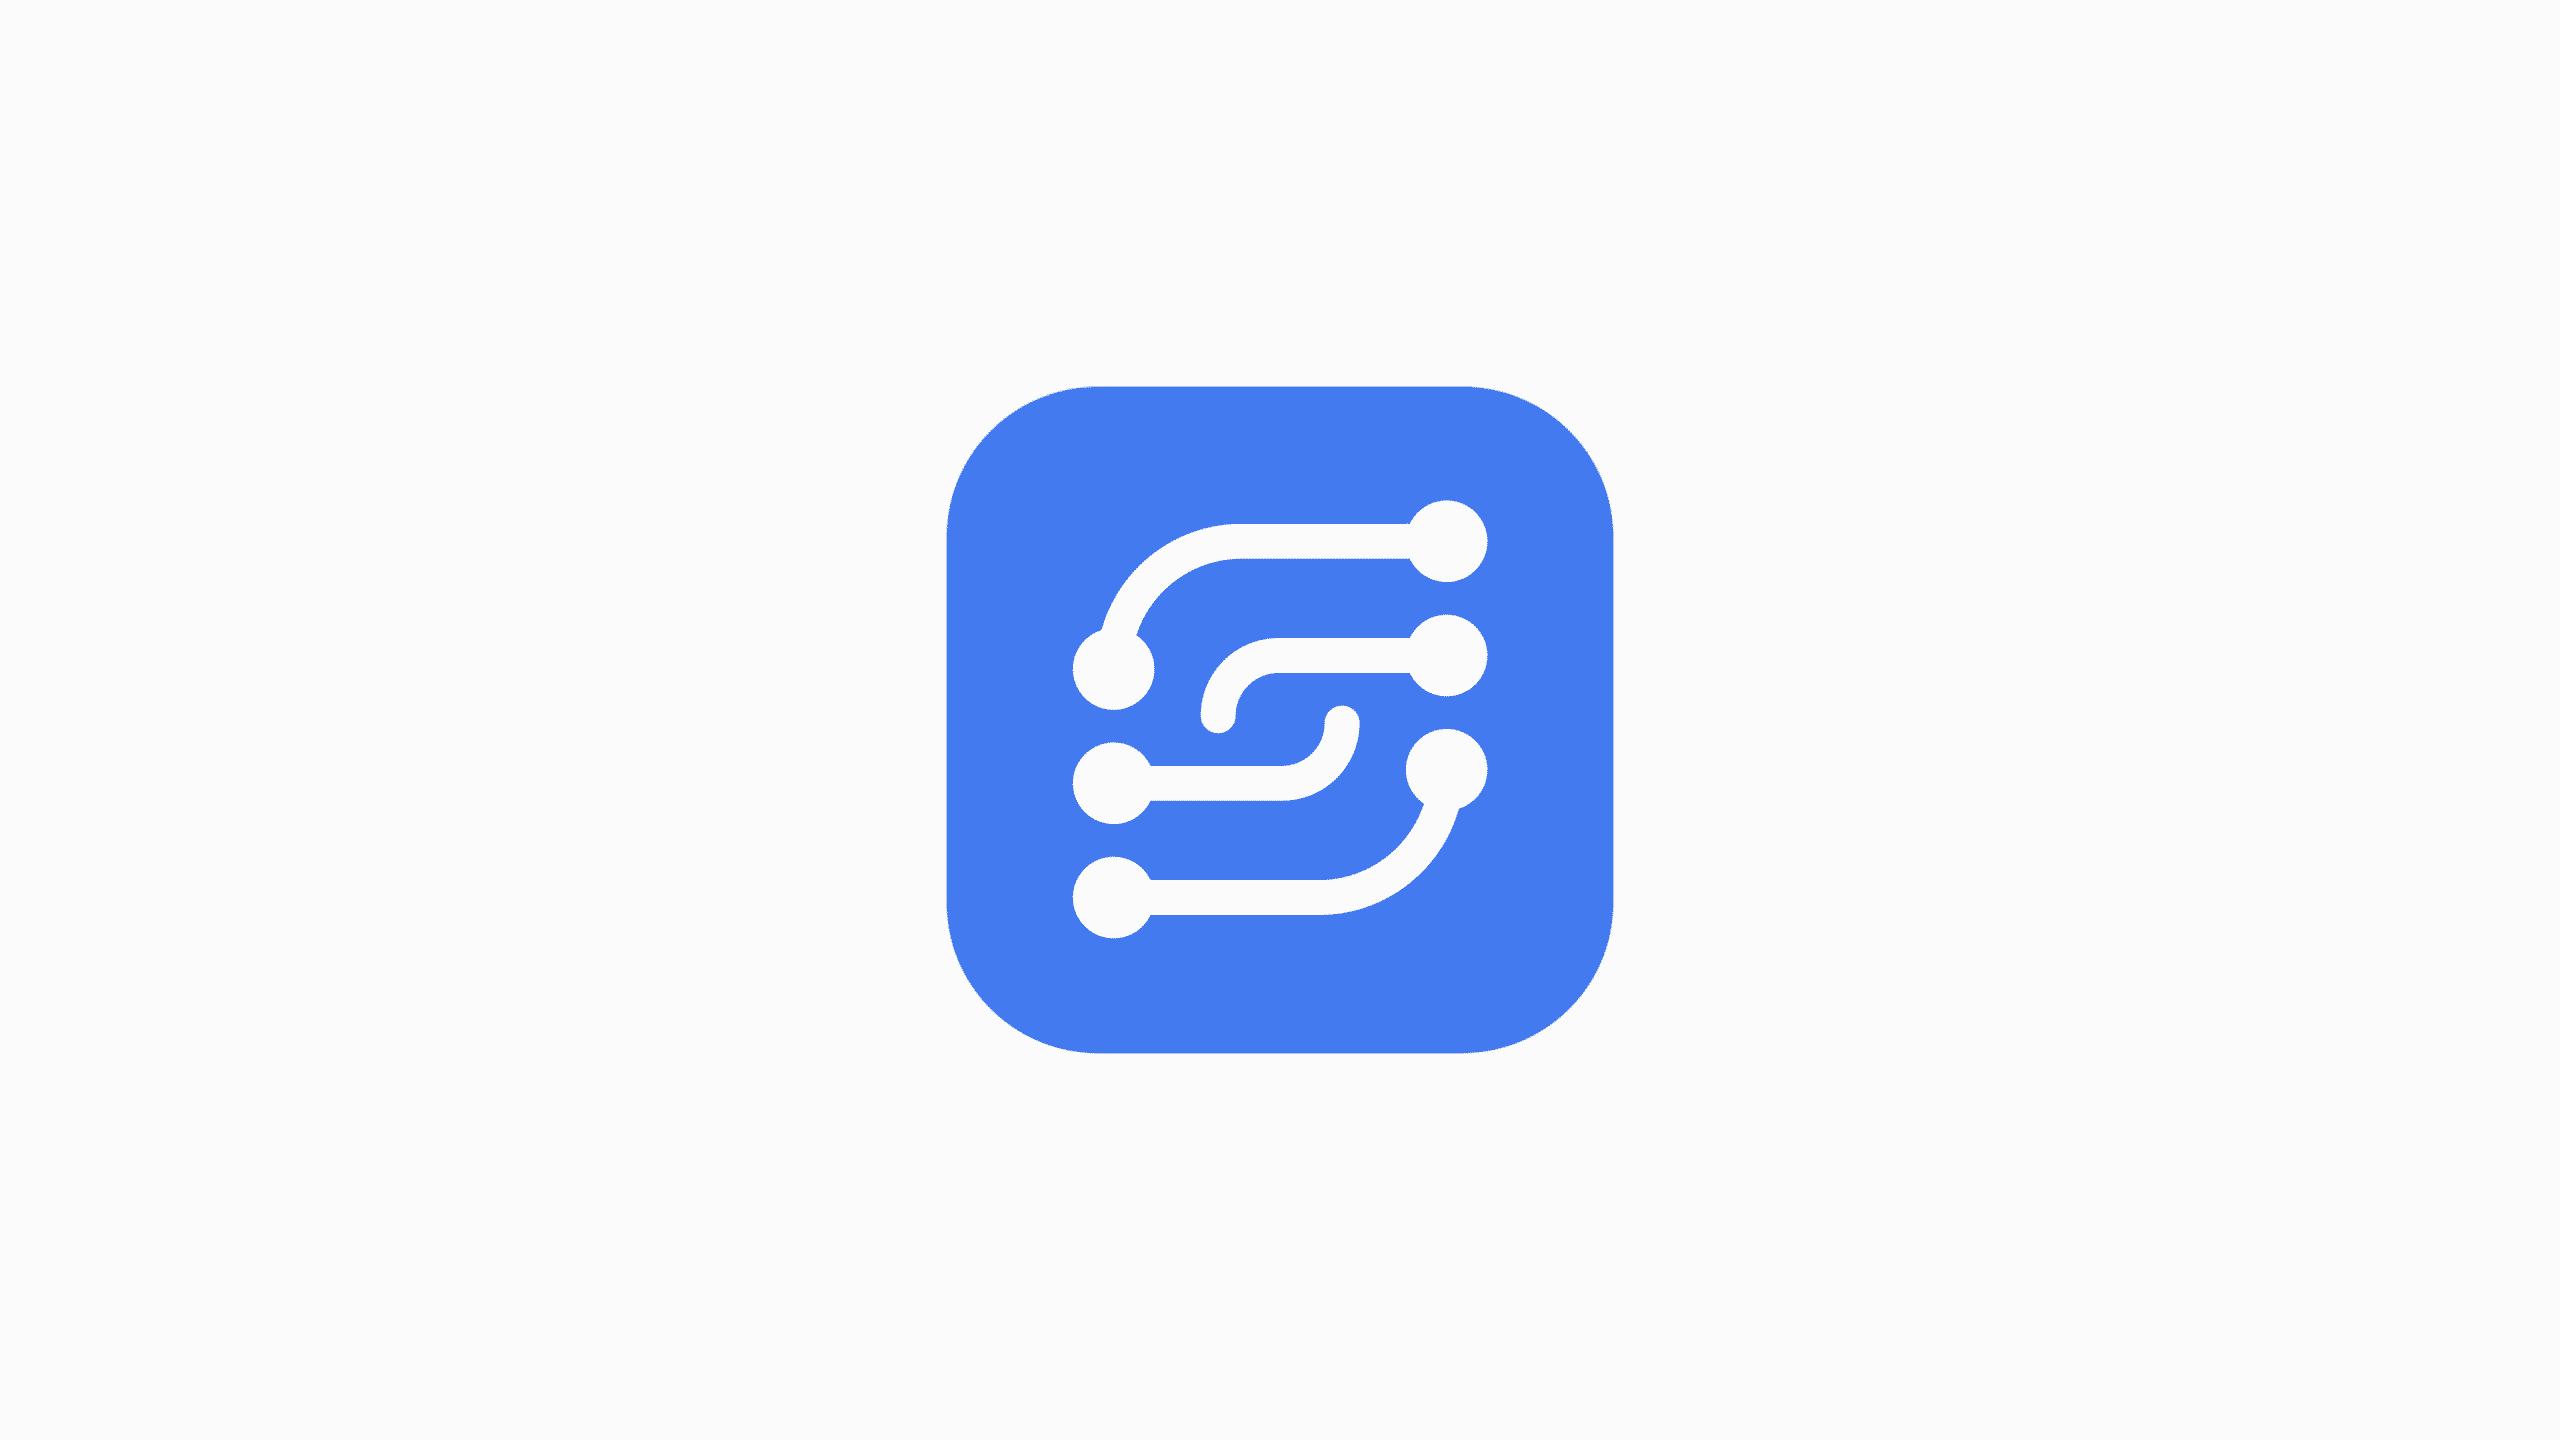 Apple Begins SensorKit Framework Development for Research